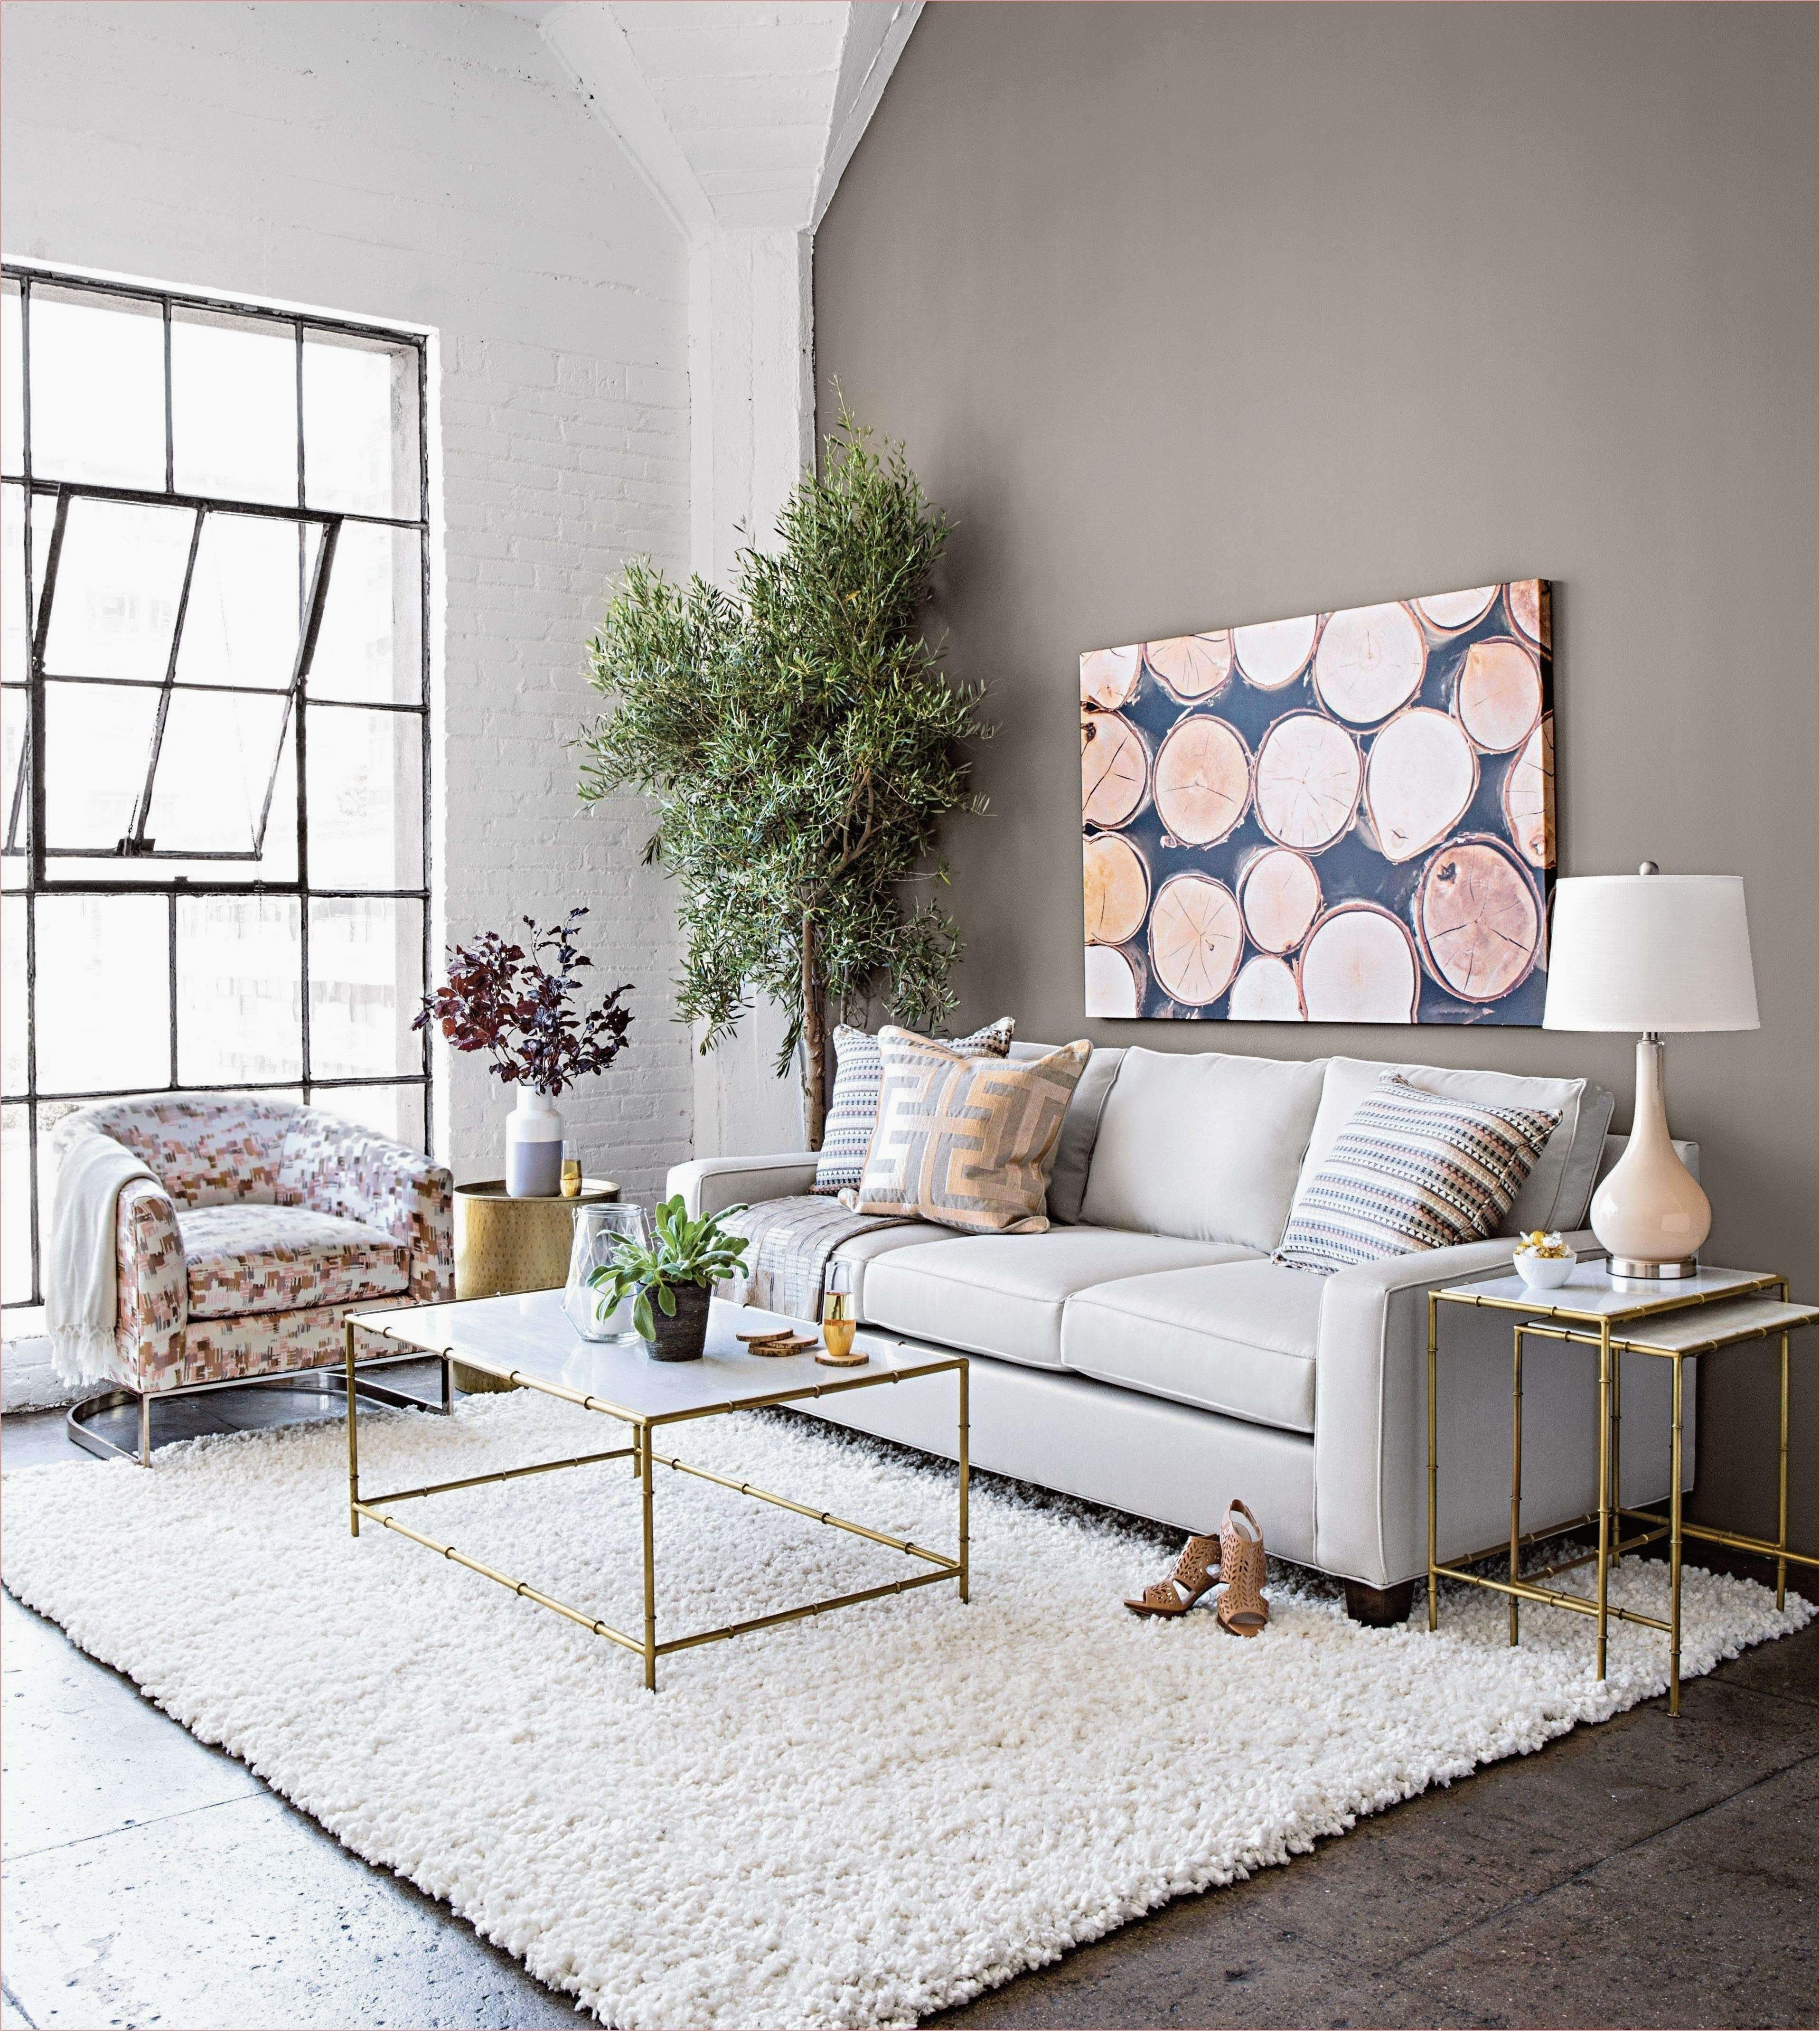 discount furniture greensboro nc inspirational 27 various e bedroom apartments greensboro nc gallery of discount furniture